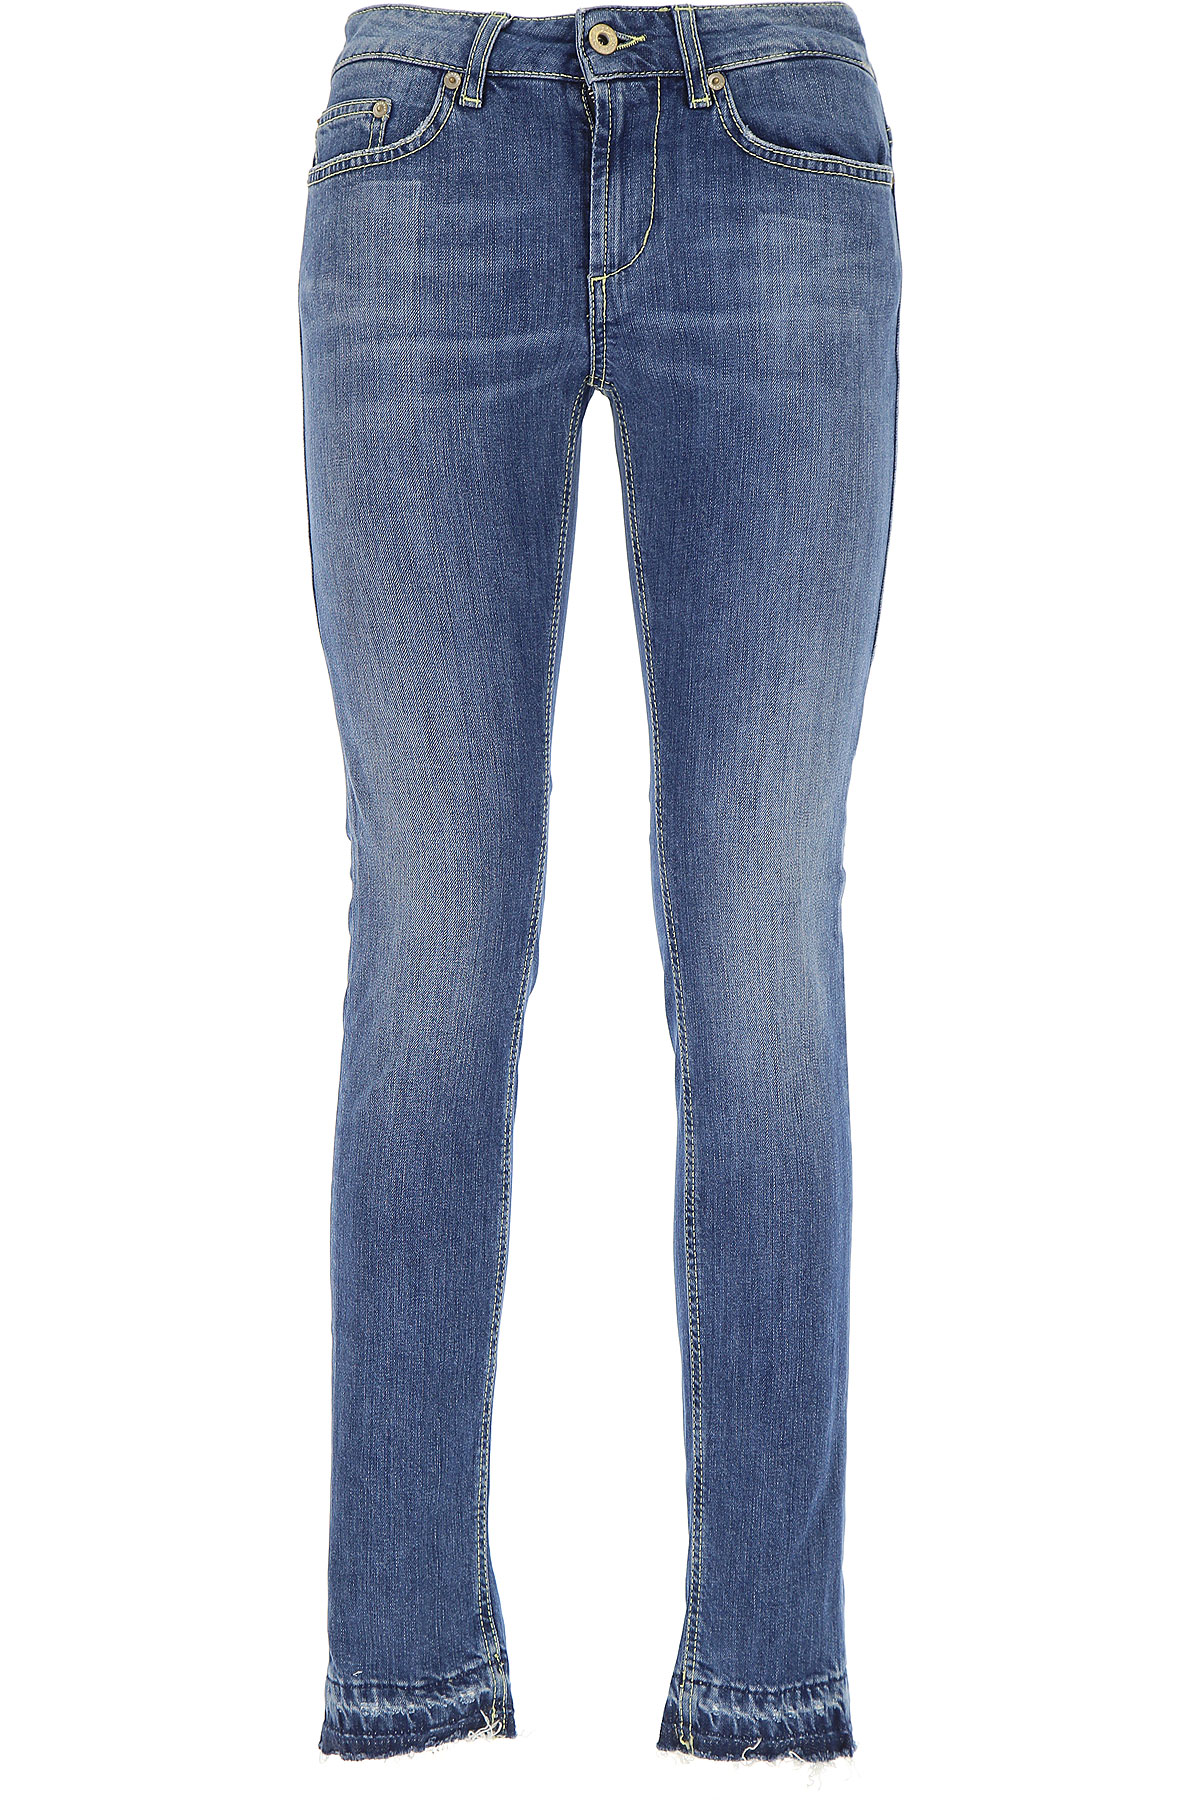 Dondup Jeans On Sale, Denim Blue, polyester, 2017, 25 26 27 30 31 32 33